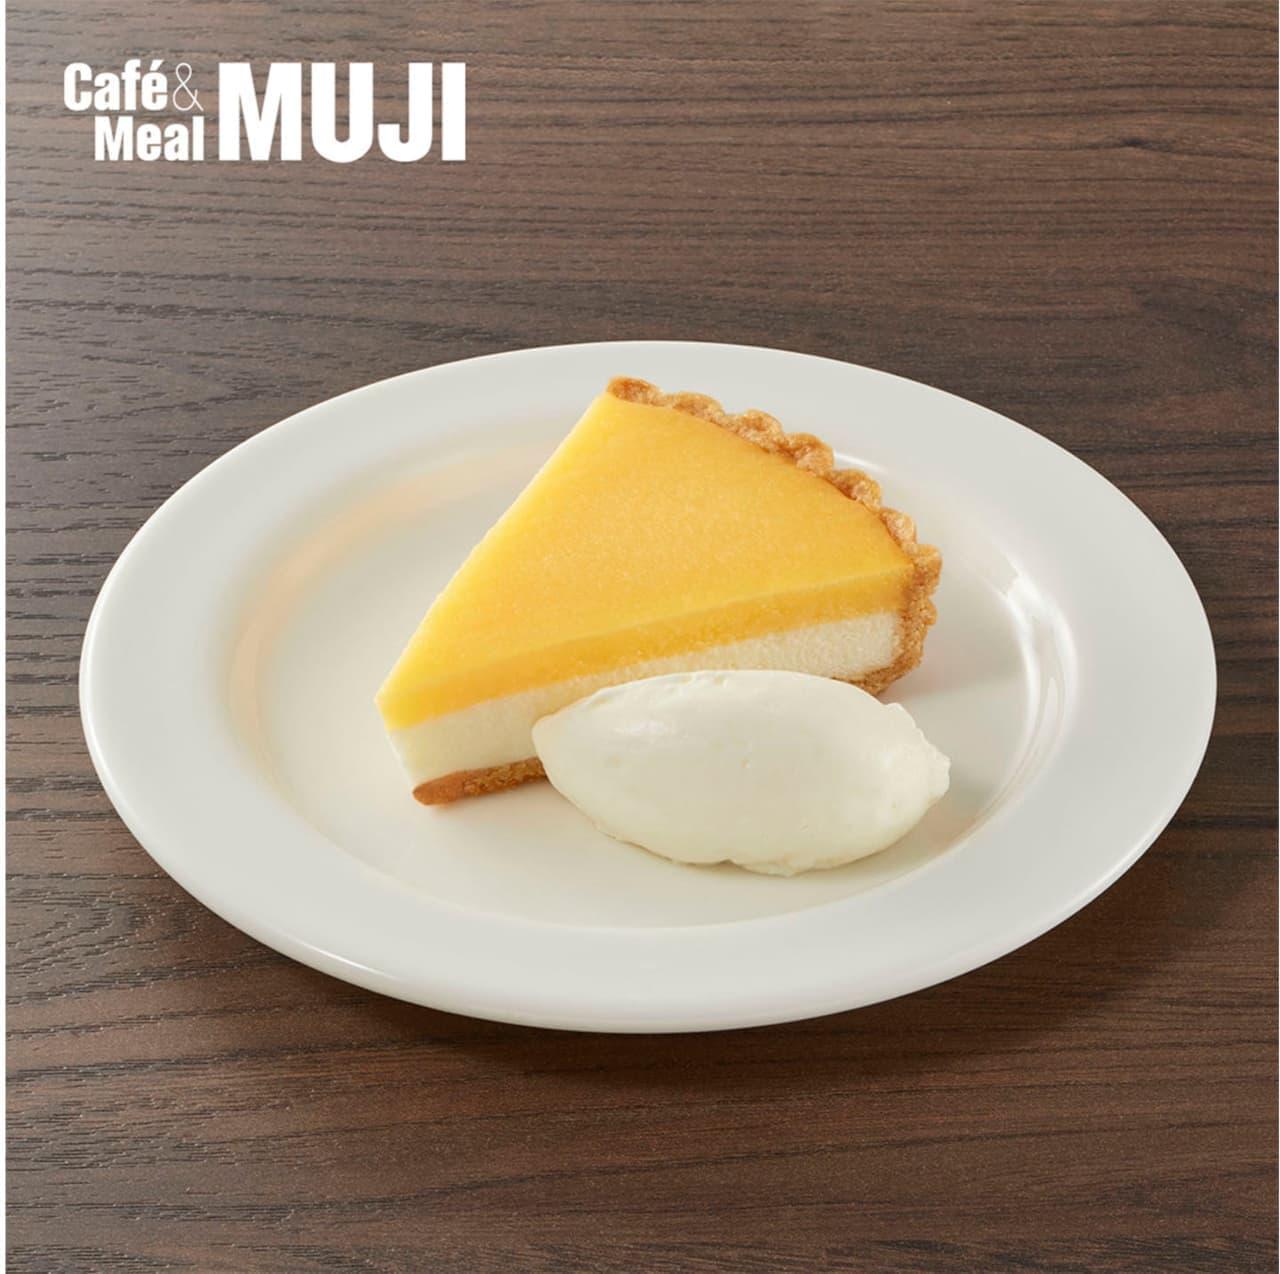 Cafe&Meal MUJI「檸檬タルト」「檸檬のサイダー」「土佐文旦のゼリー」